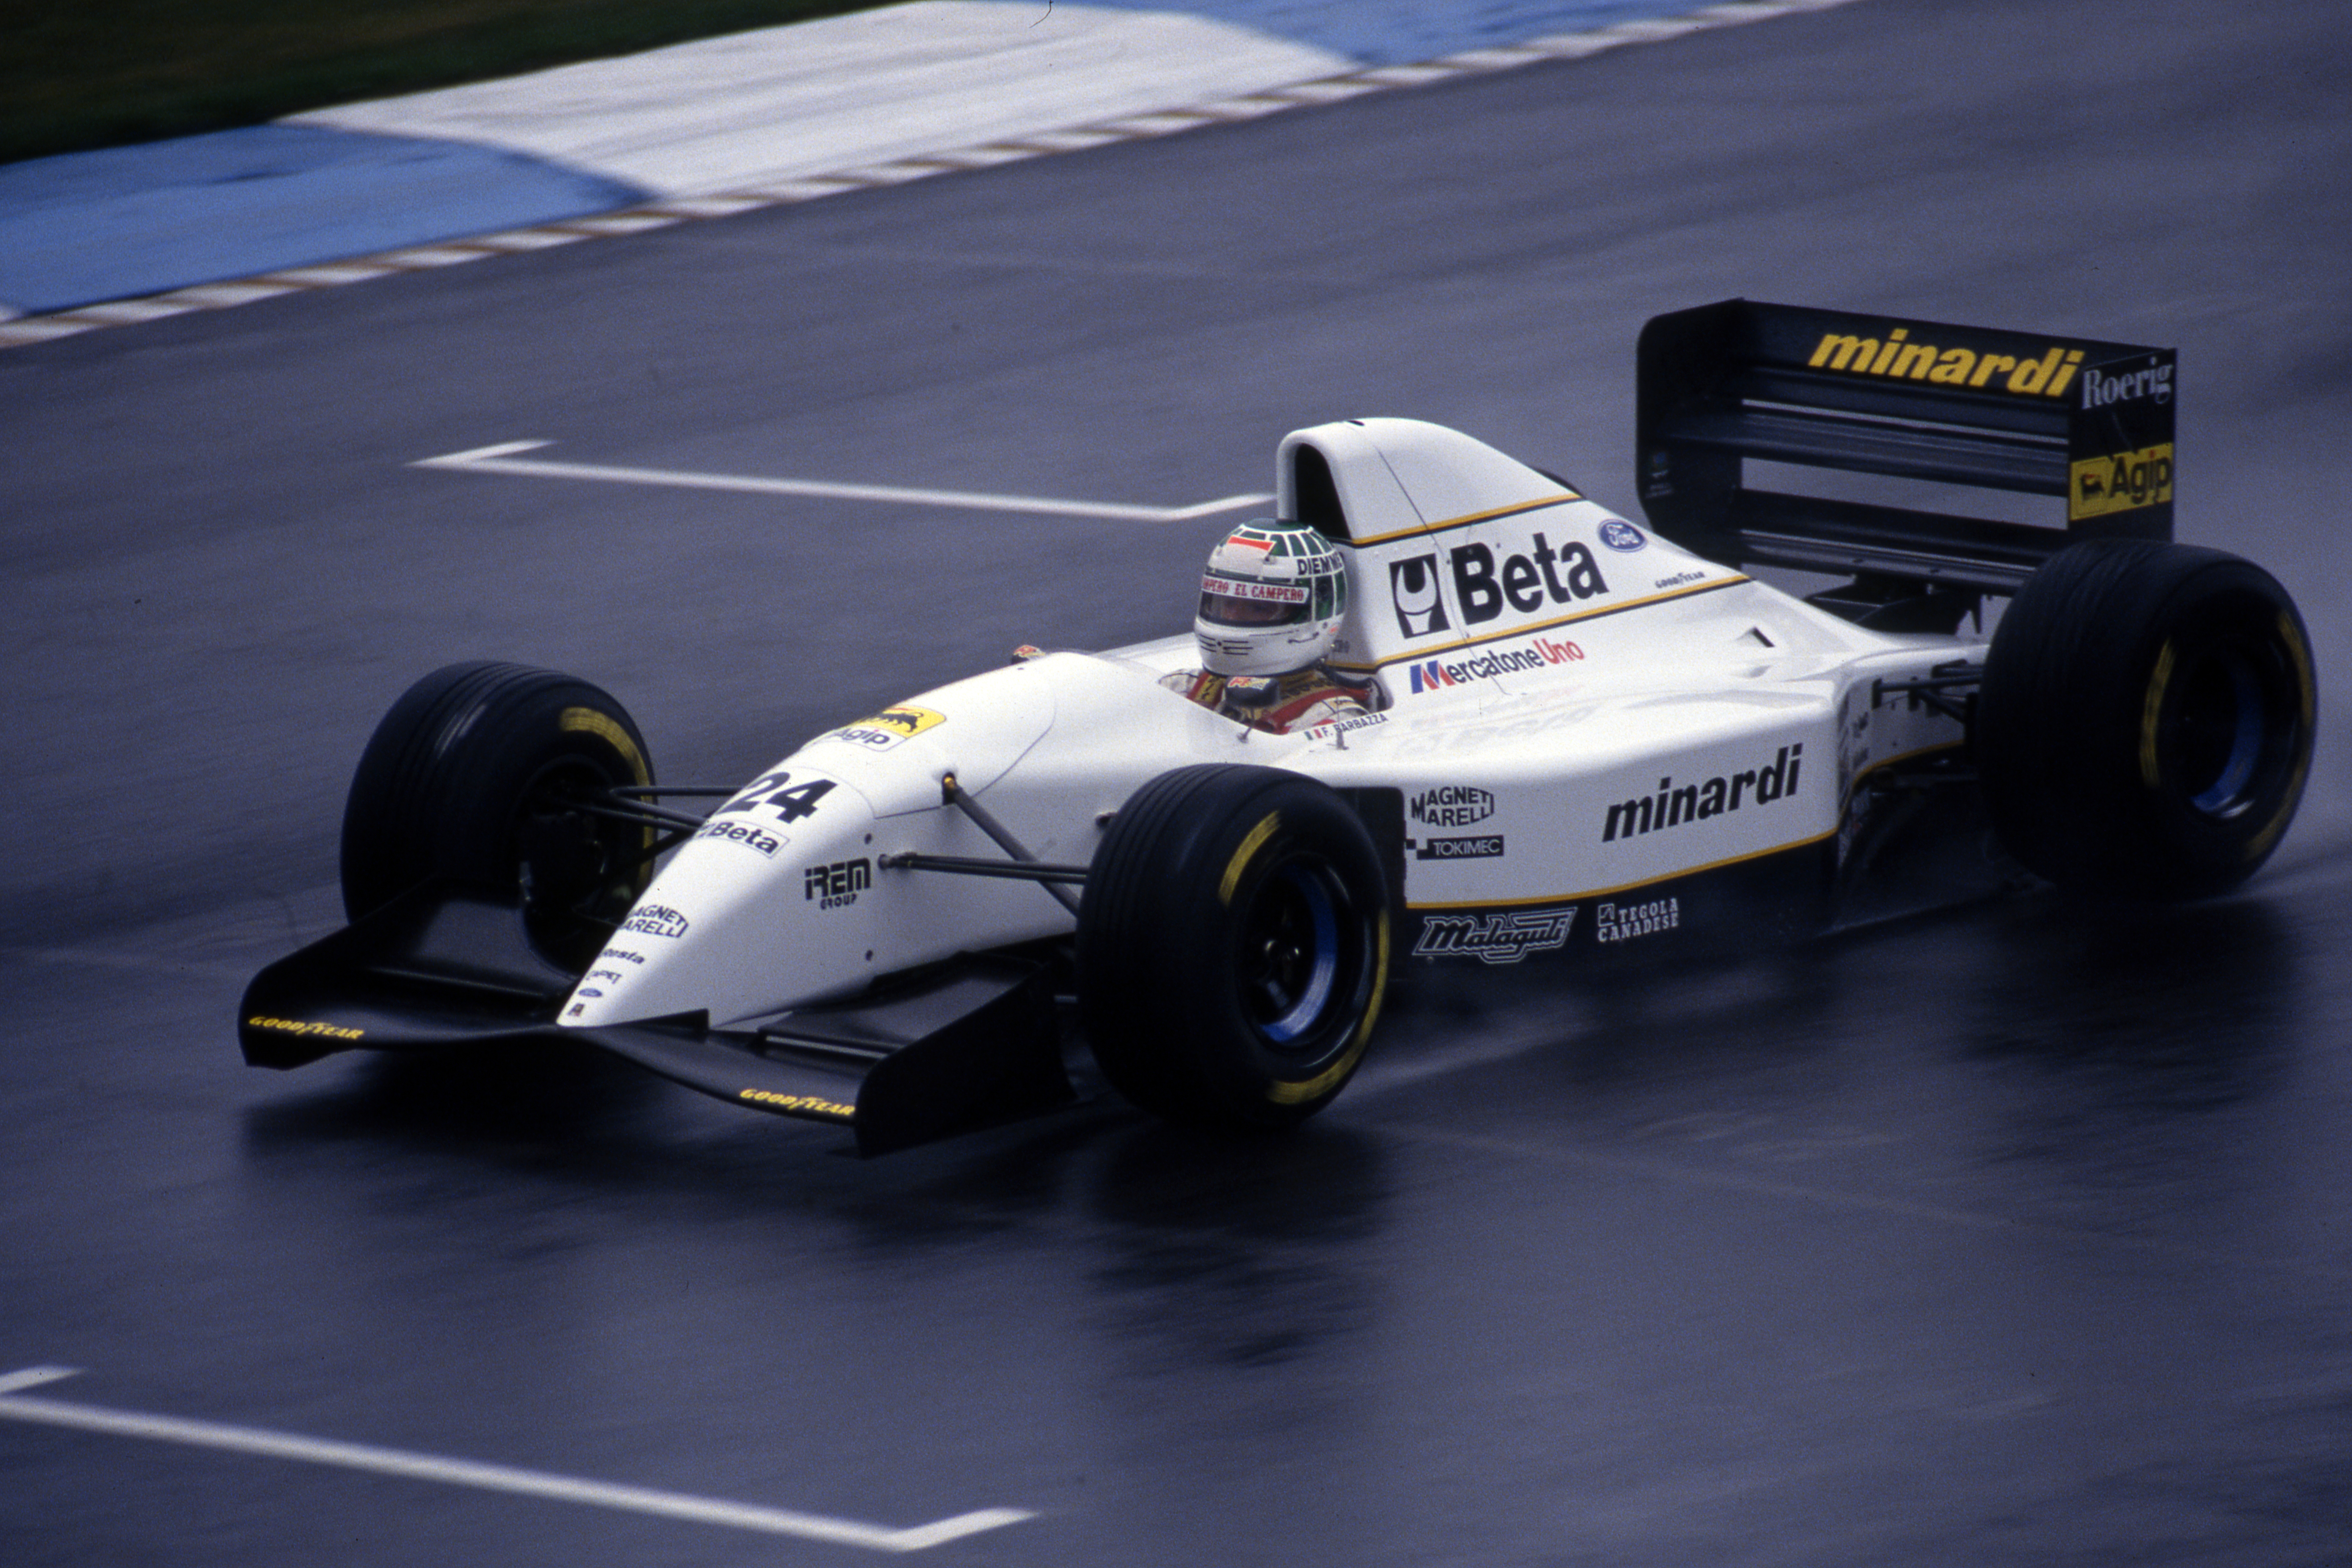 European Grand Prix Donington Park (gbr) 09 11 04 1993